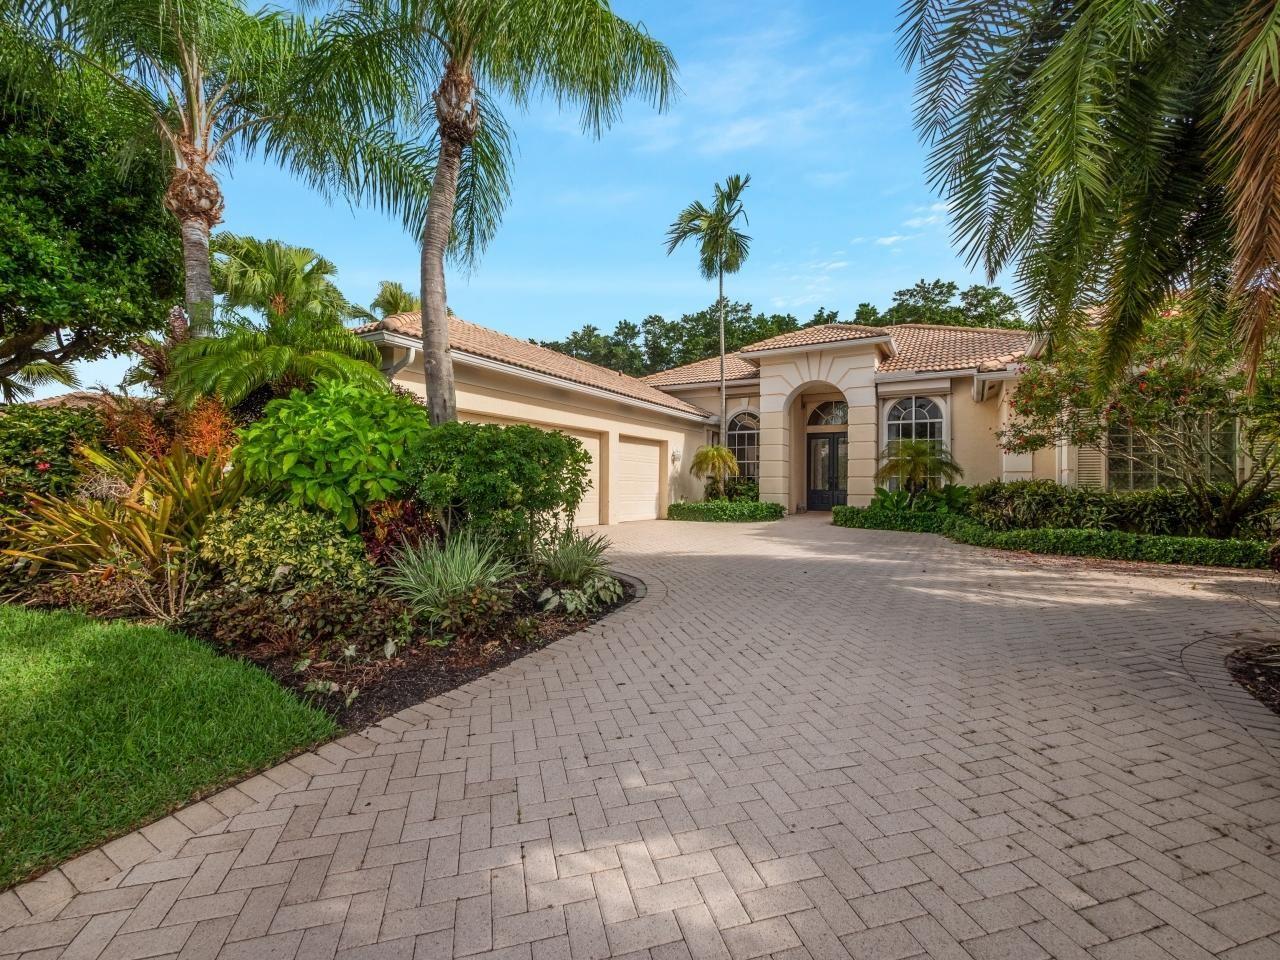 25 Bermuda Lake Drive, Palm Beach Gardens, FL 33418 - MLS#: RX-10722469